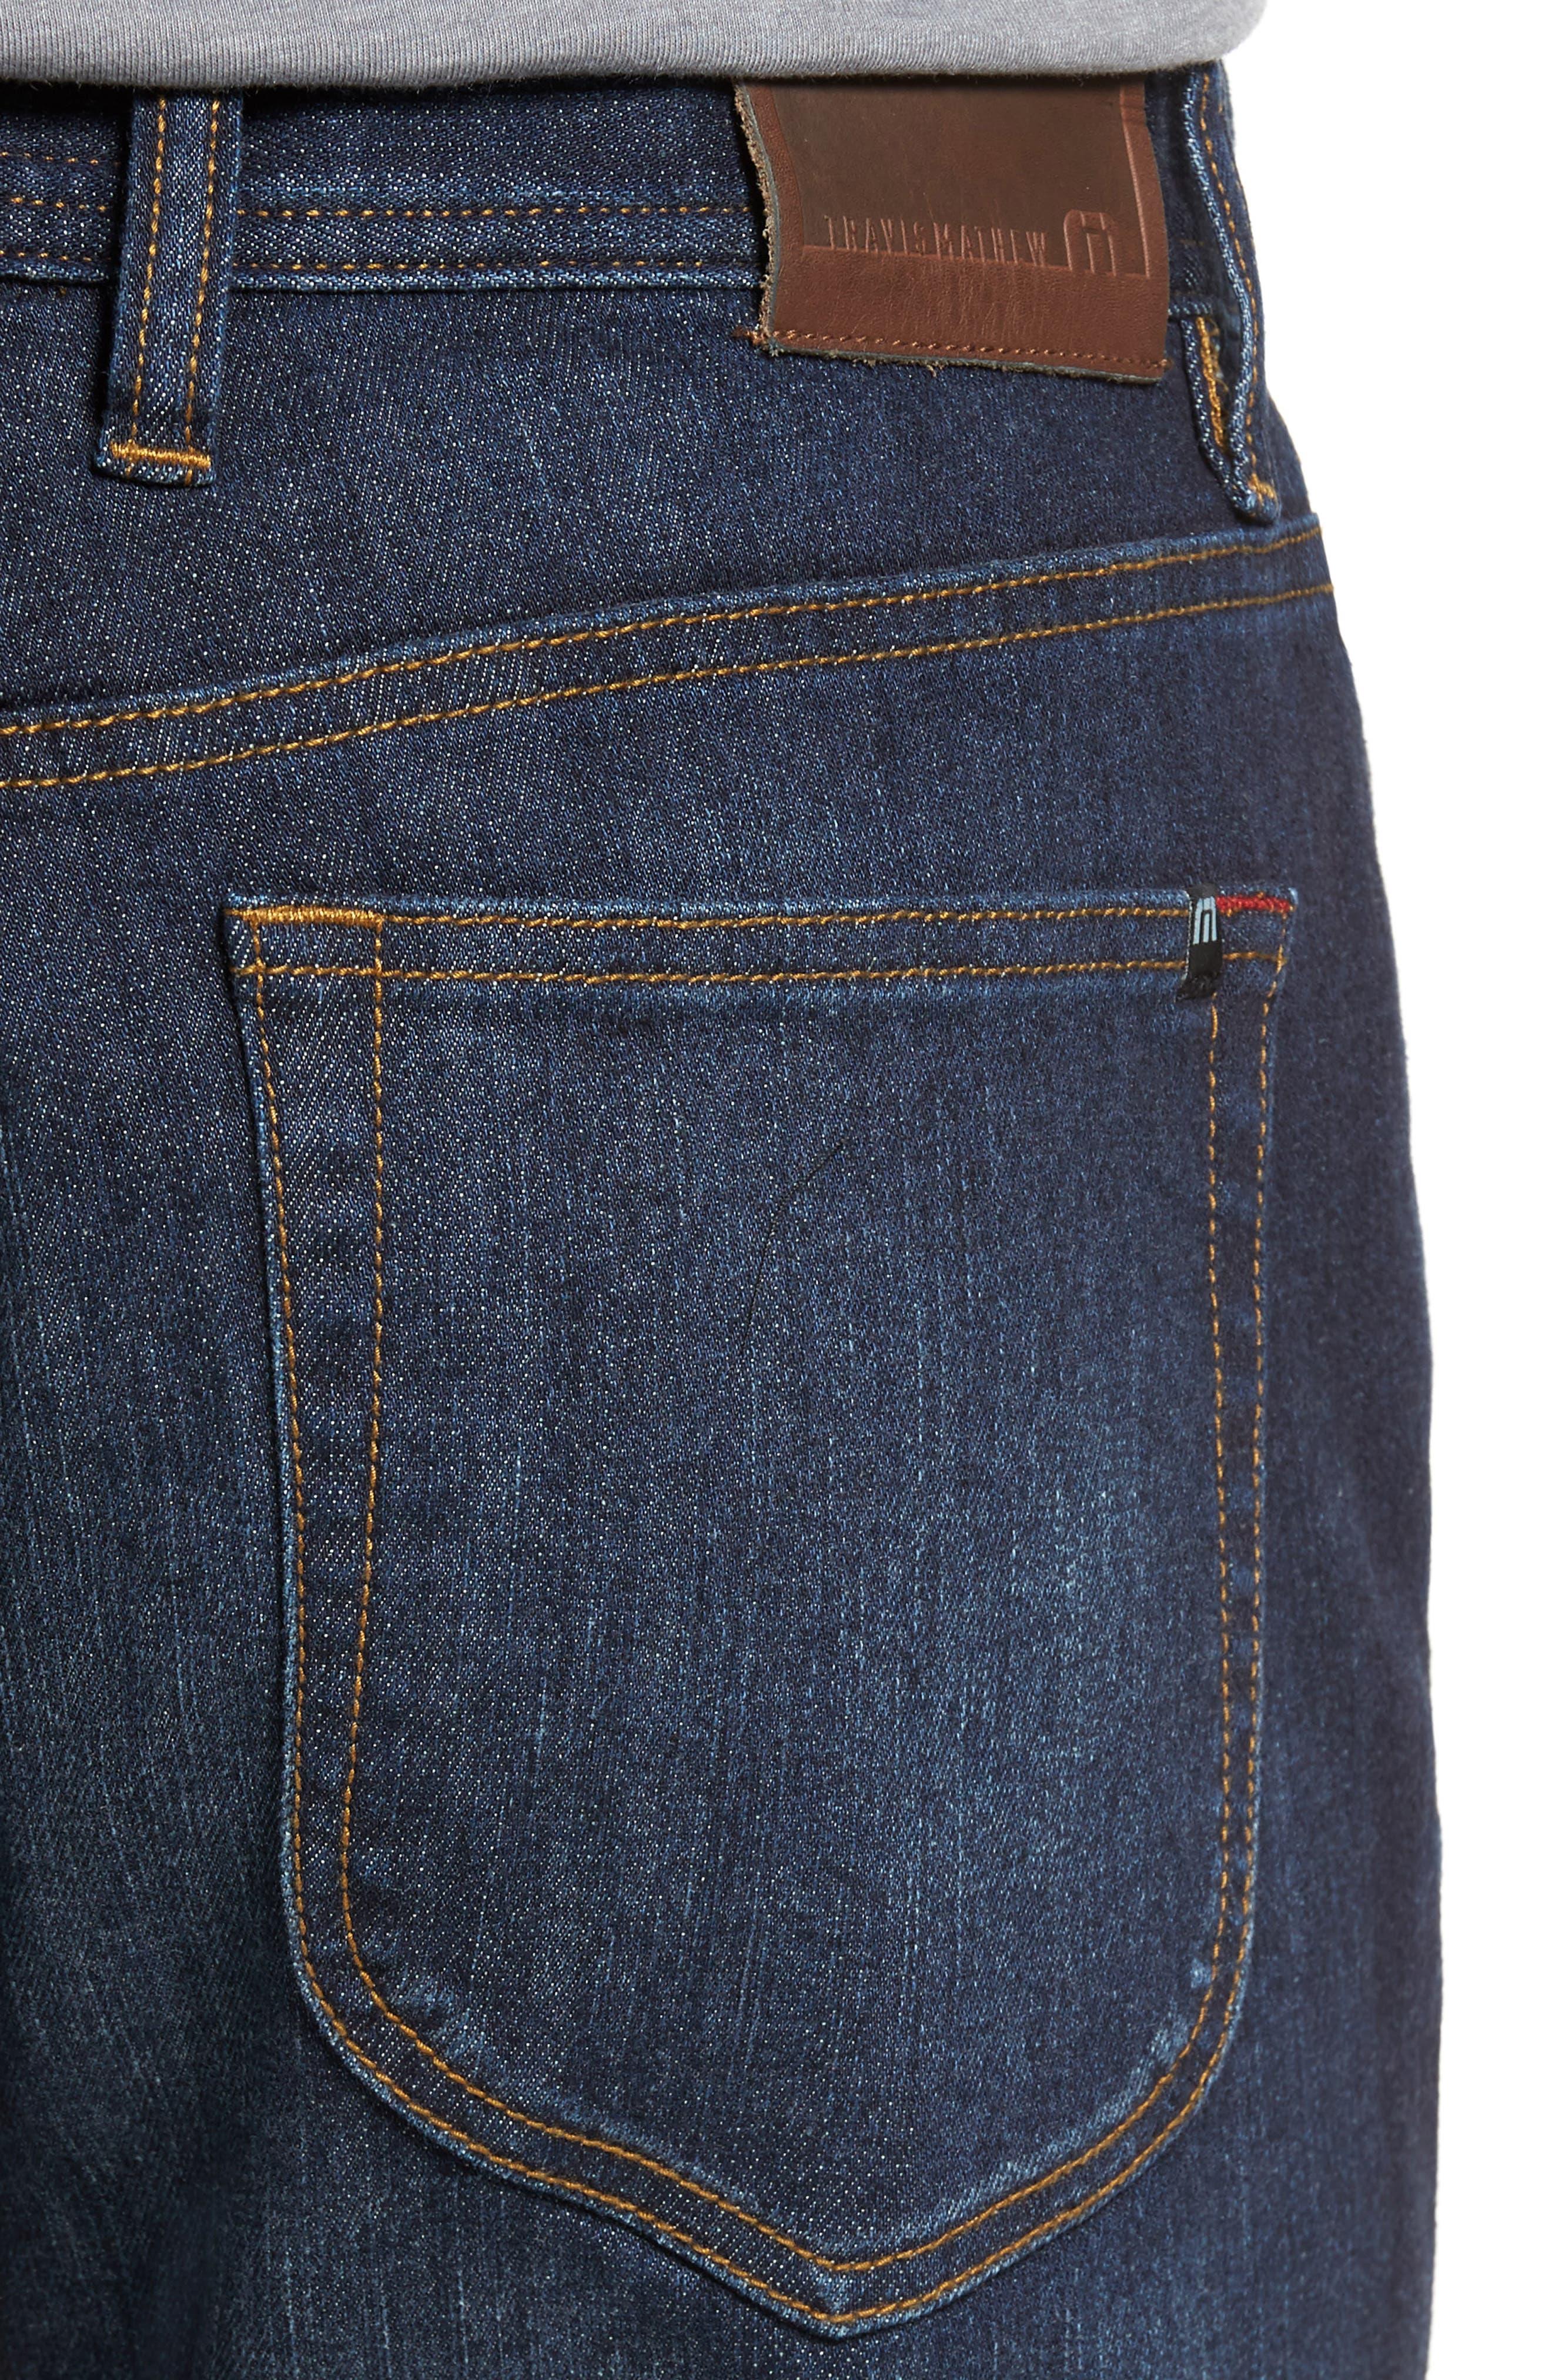 Alternate Image 4  - Travis Mathew 'Duke' Relaxed Fit Jeans (Vintage Indigo)